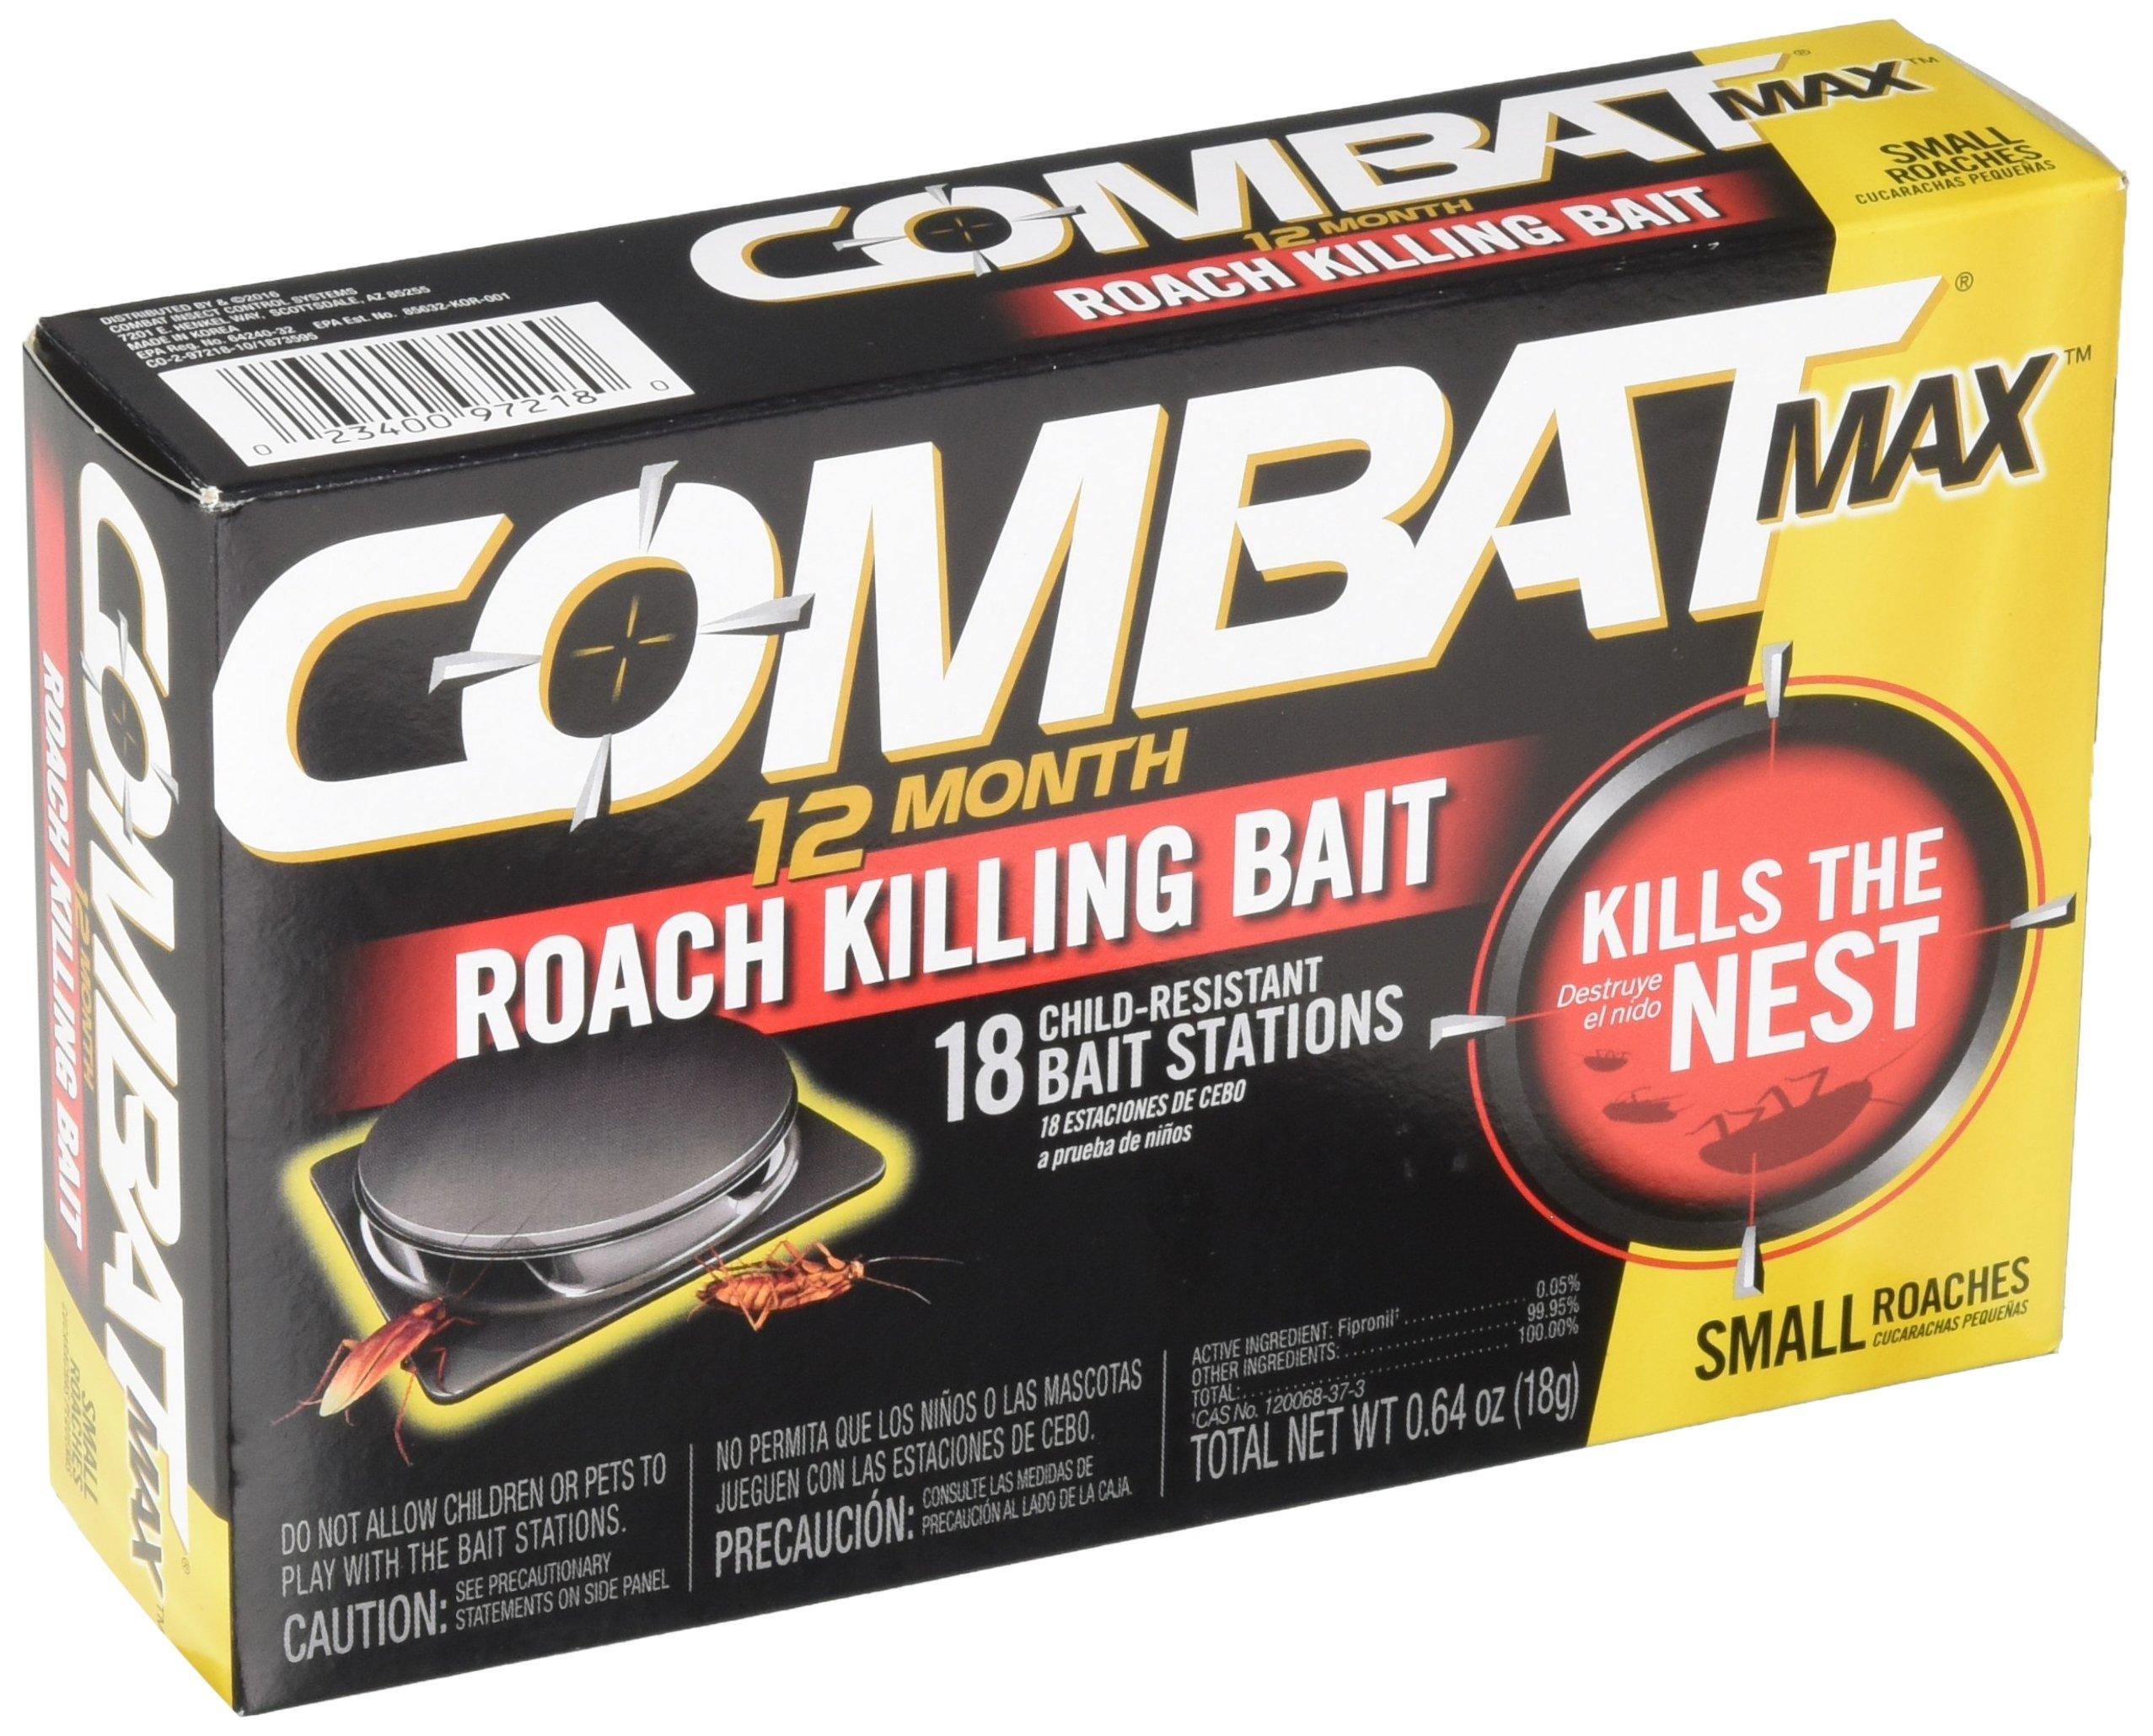 Combat Max 12 Month Roach Killing Bait, Small Roach Bait Station, 18 Count